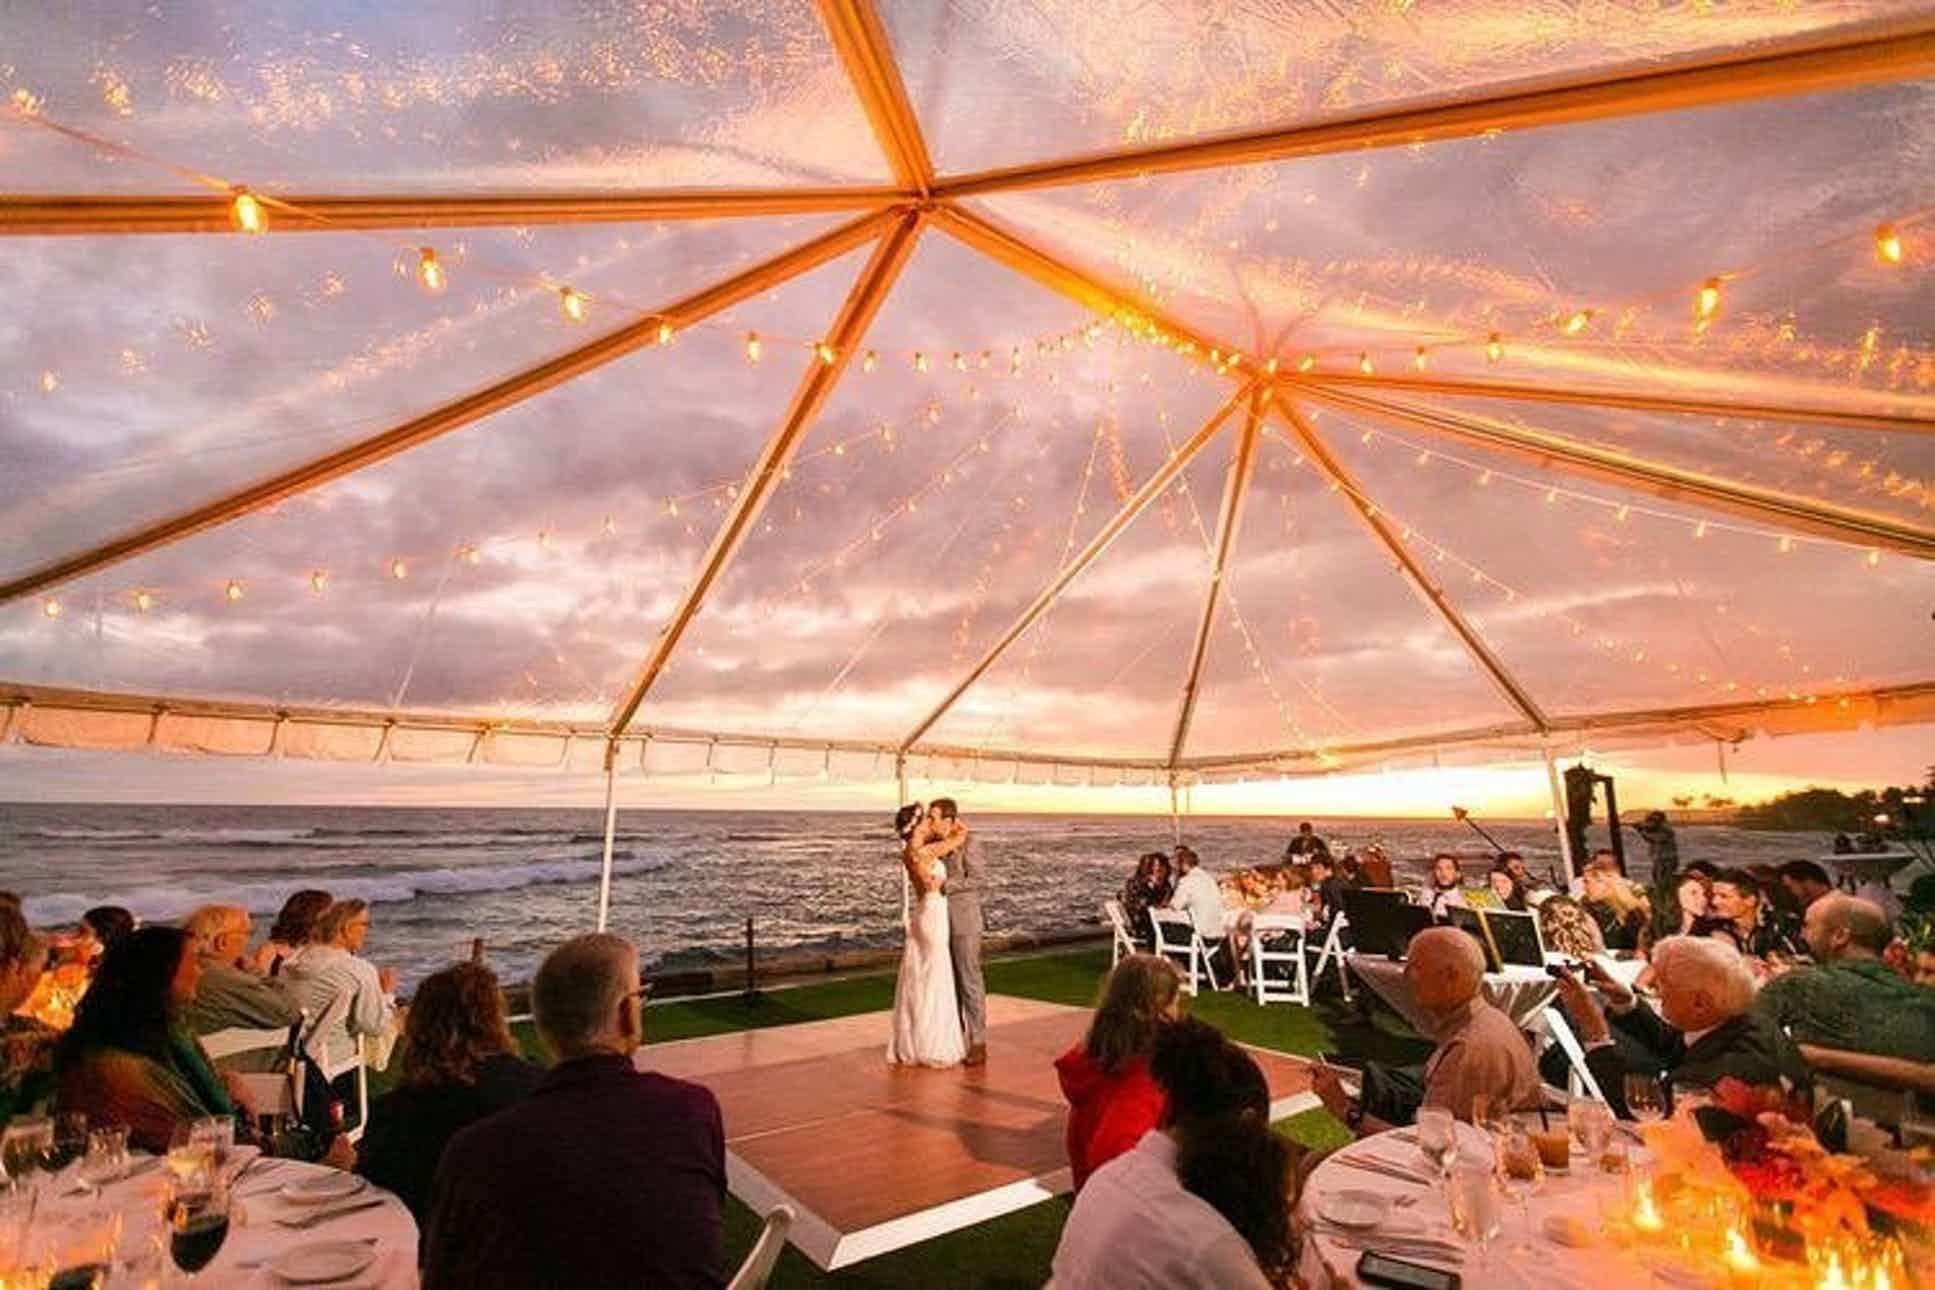 Beach House Restaurant Koloa And Other Beautiful Kauai Wedding Venues Detailed Info Prices Photos Fo In 2020 Beach House Restaurant Beach House Kauai Kauai Wedding